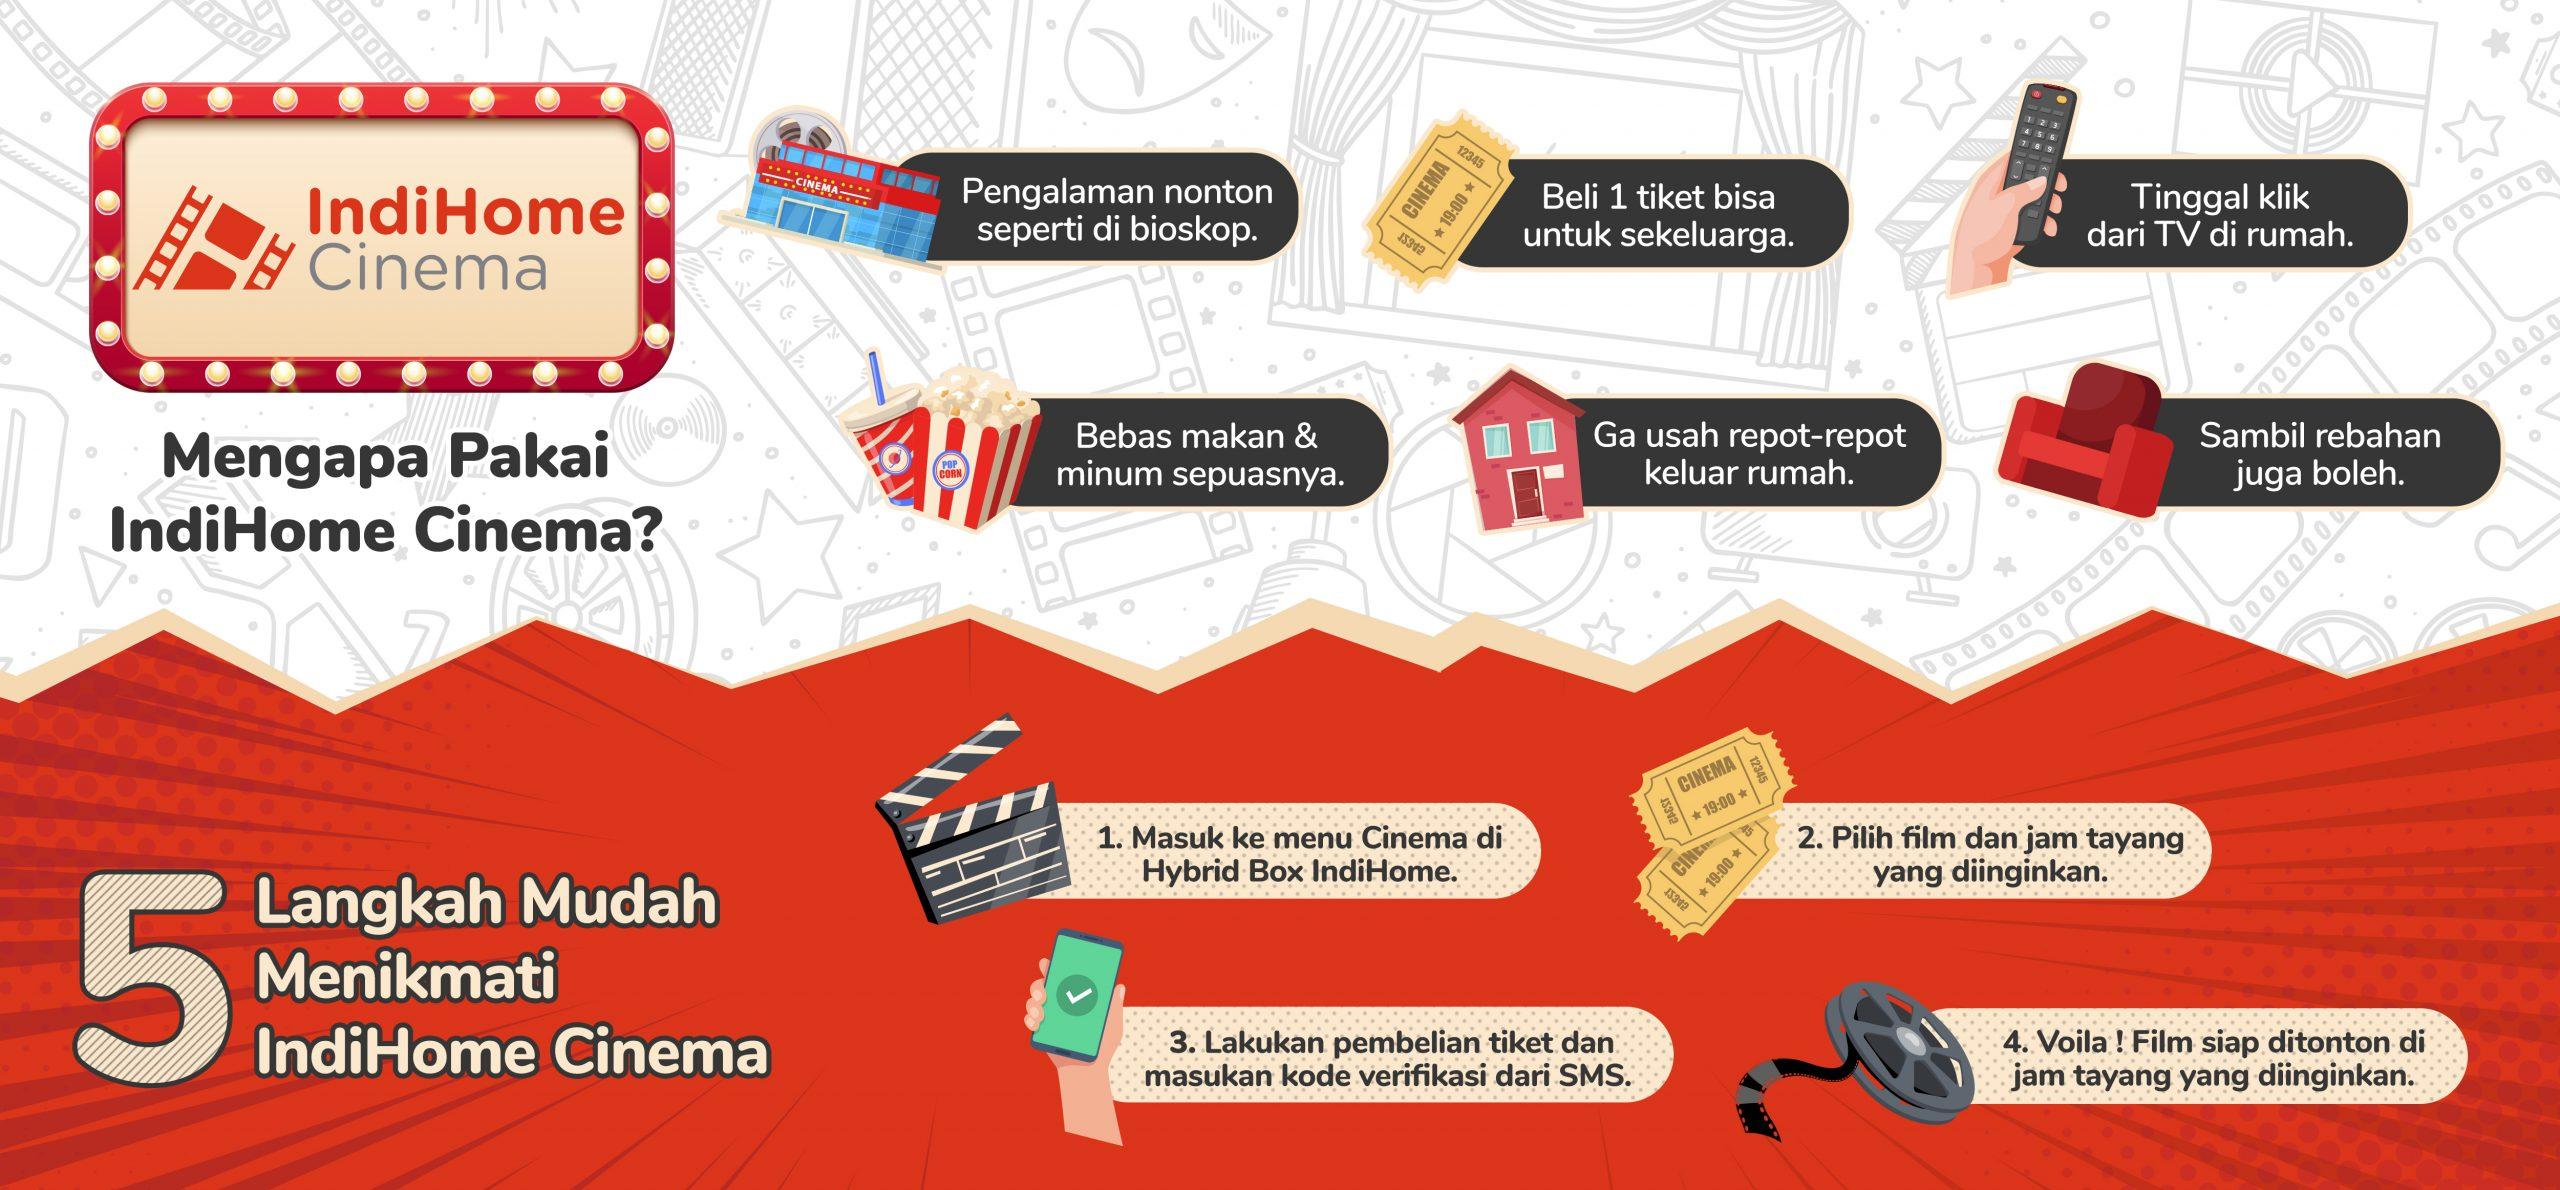 IndiHome Cinema